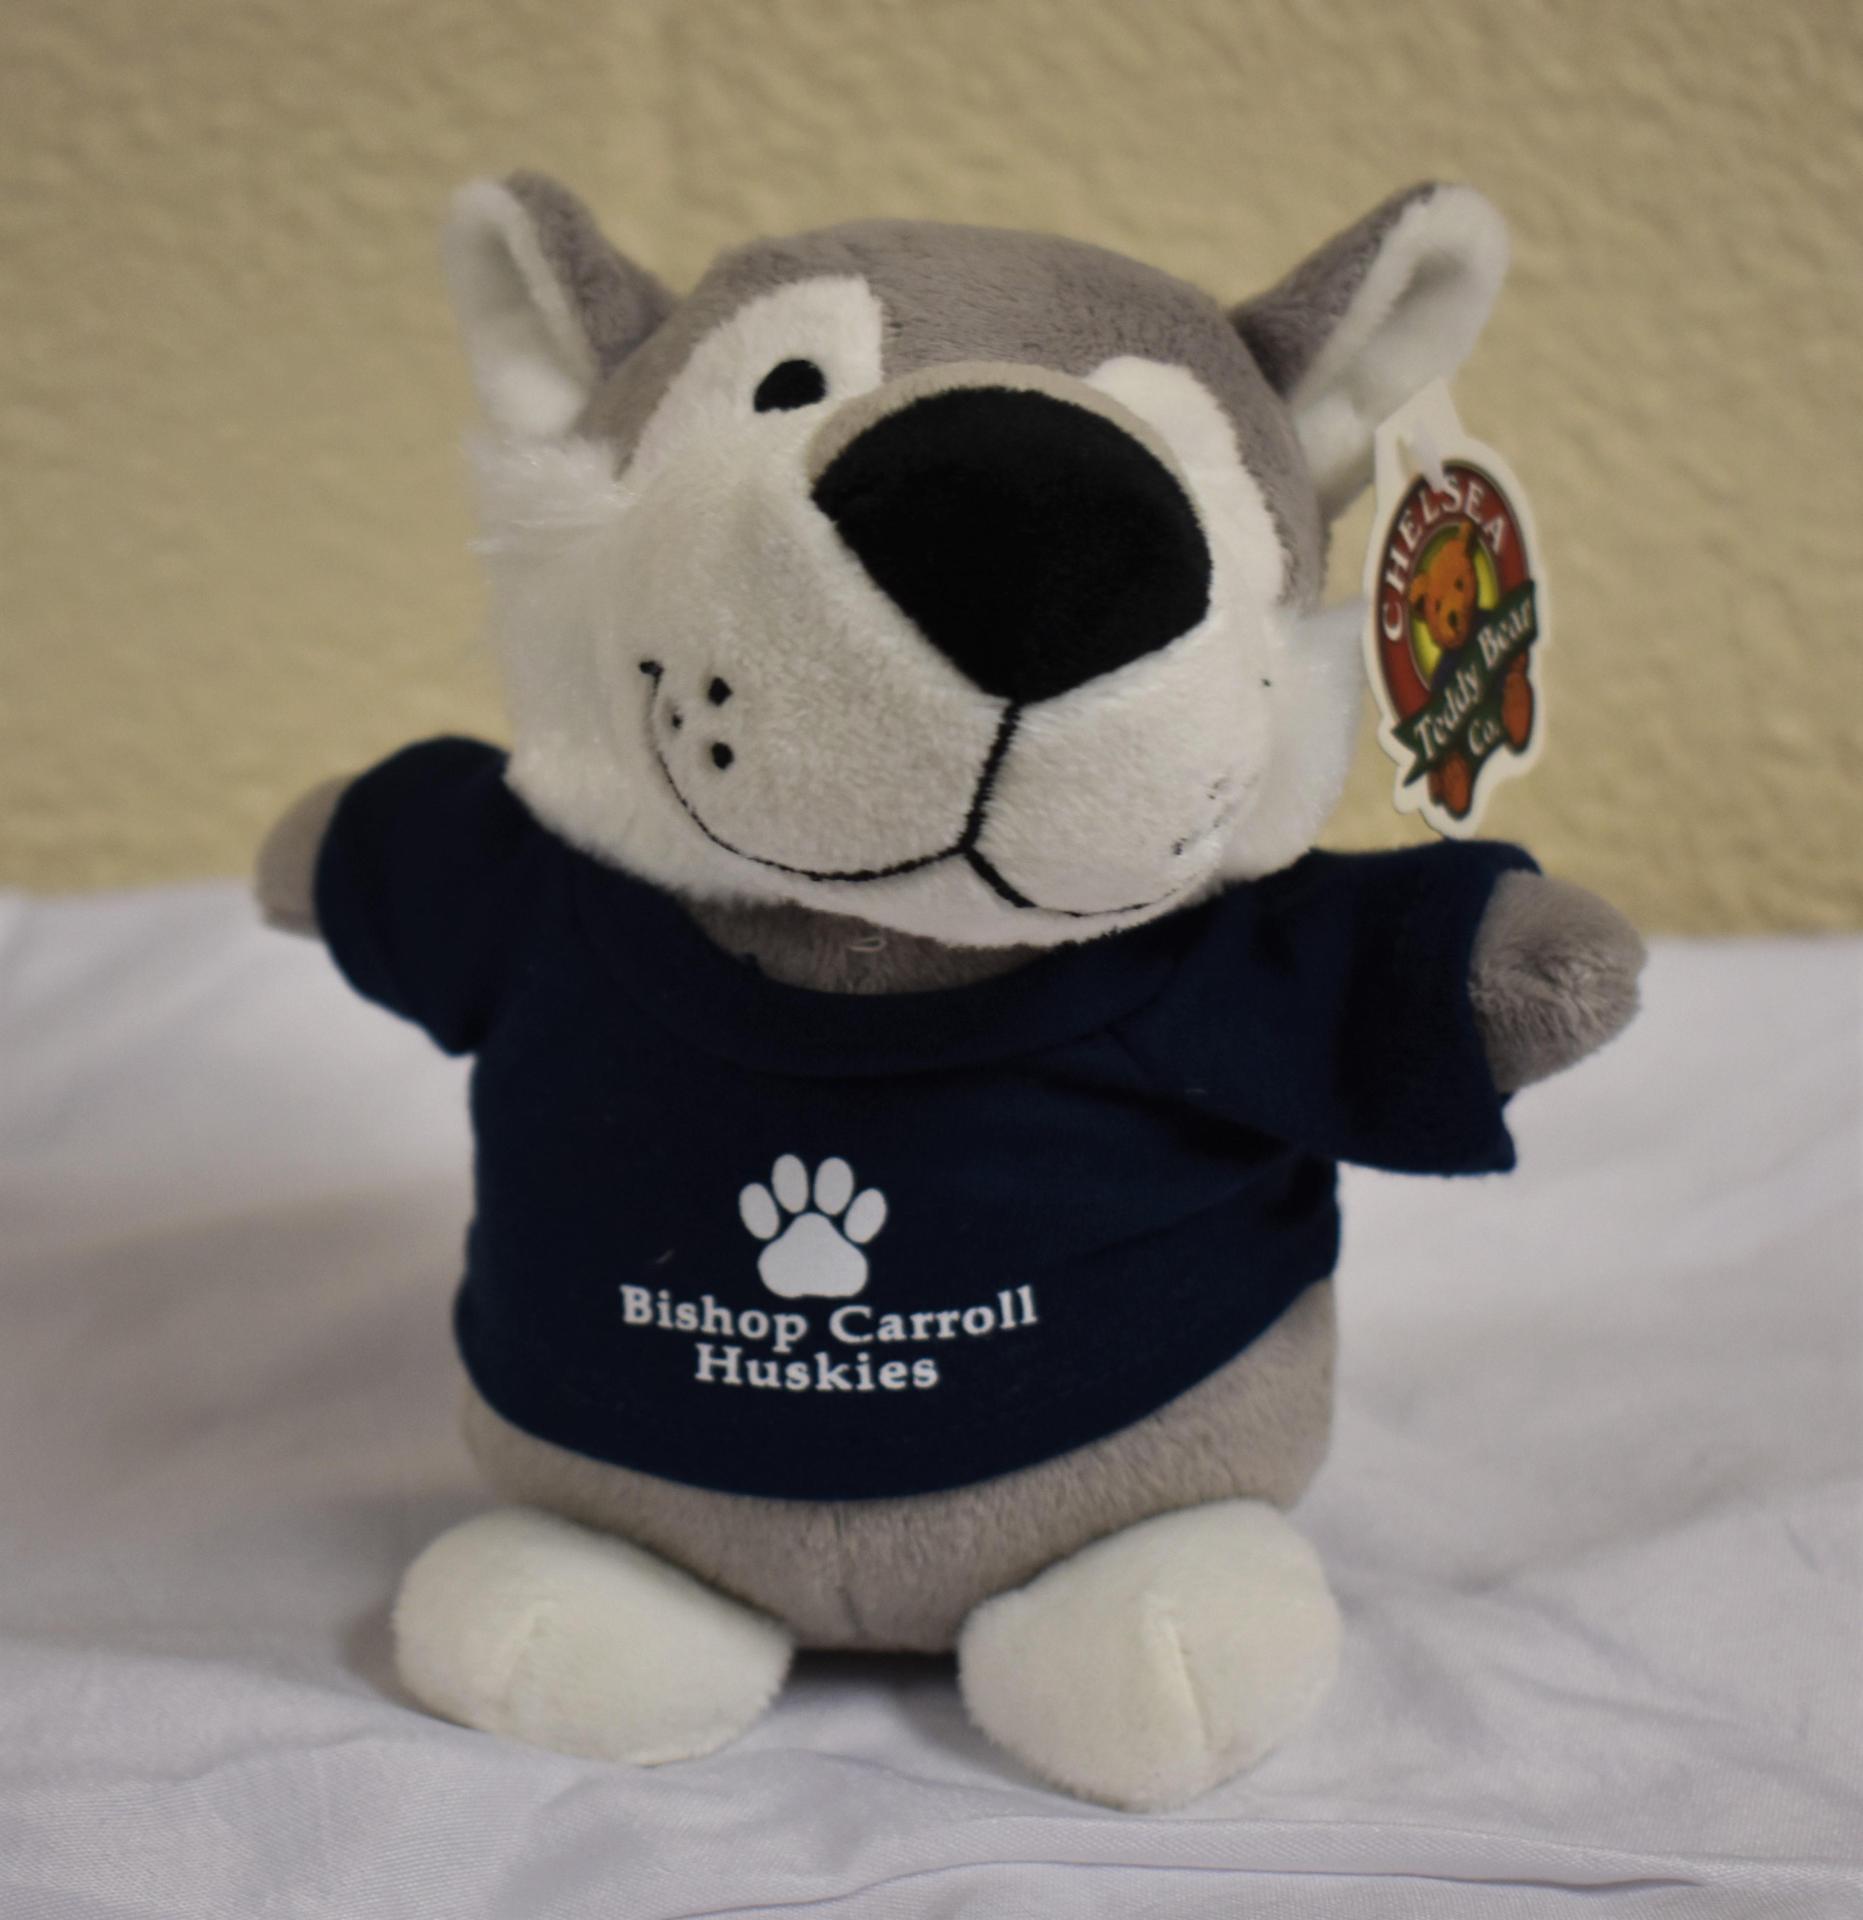 Stuffed Husky